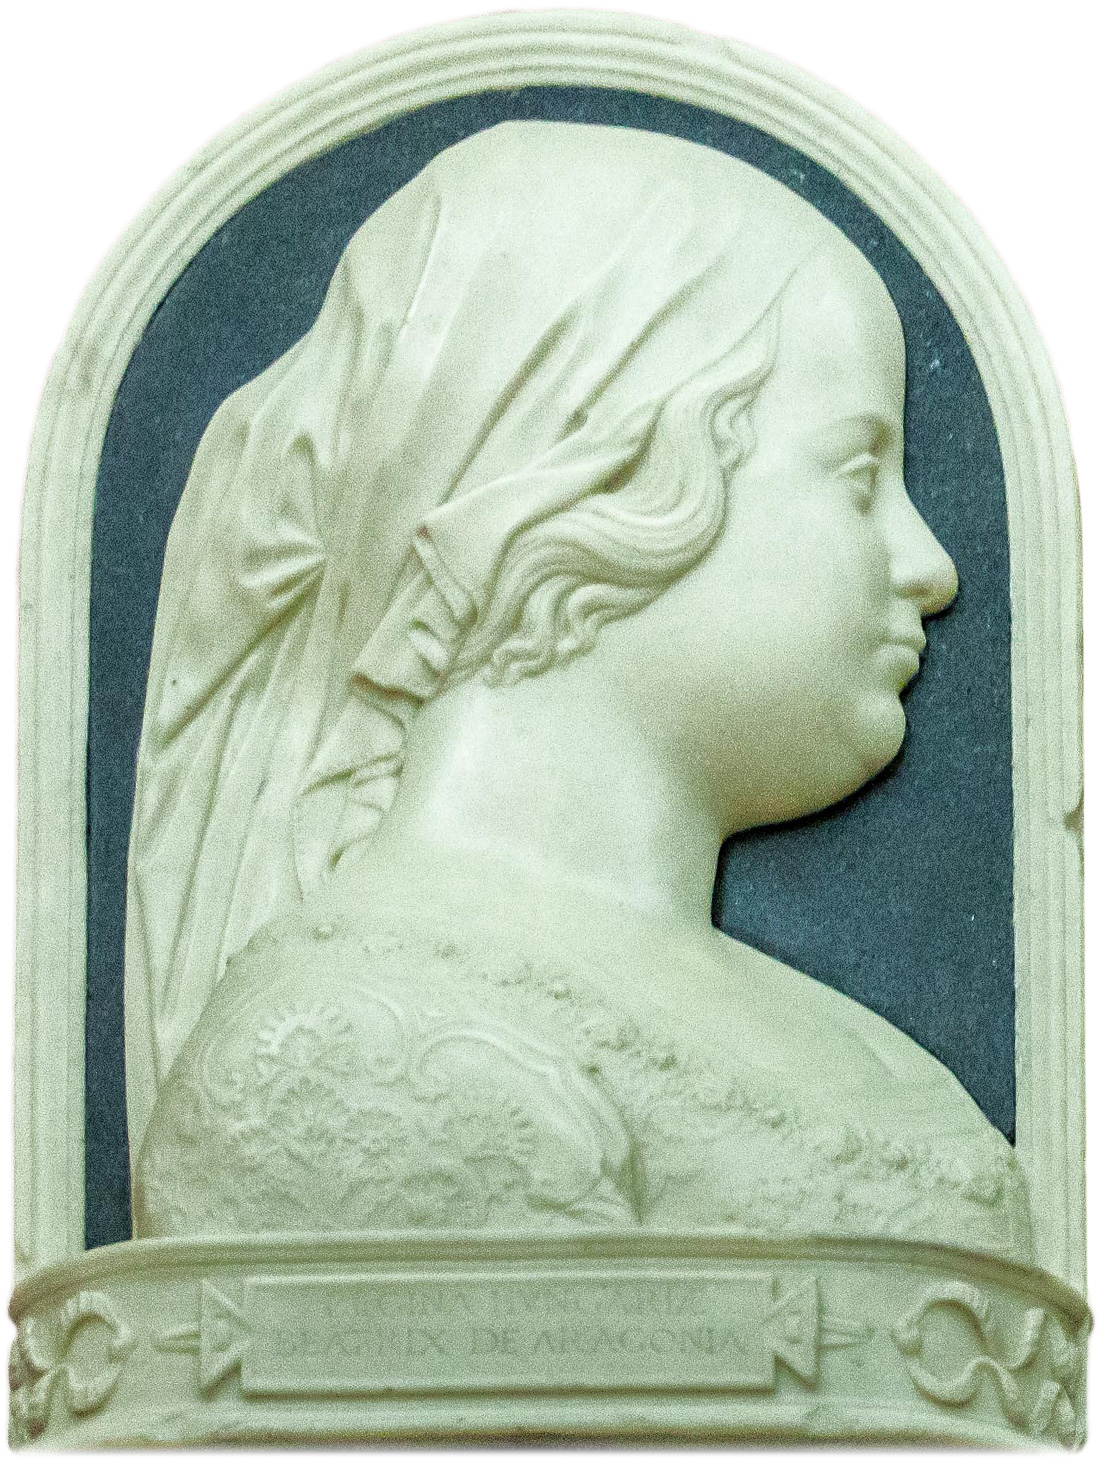 ferdinand and isabella biography